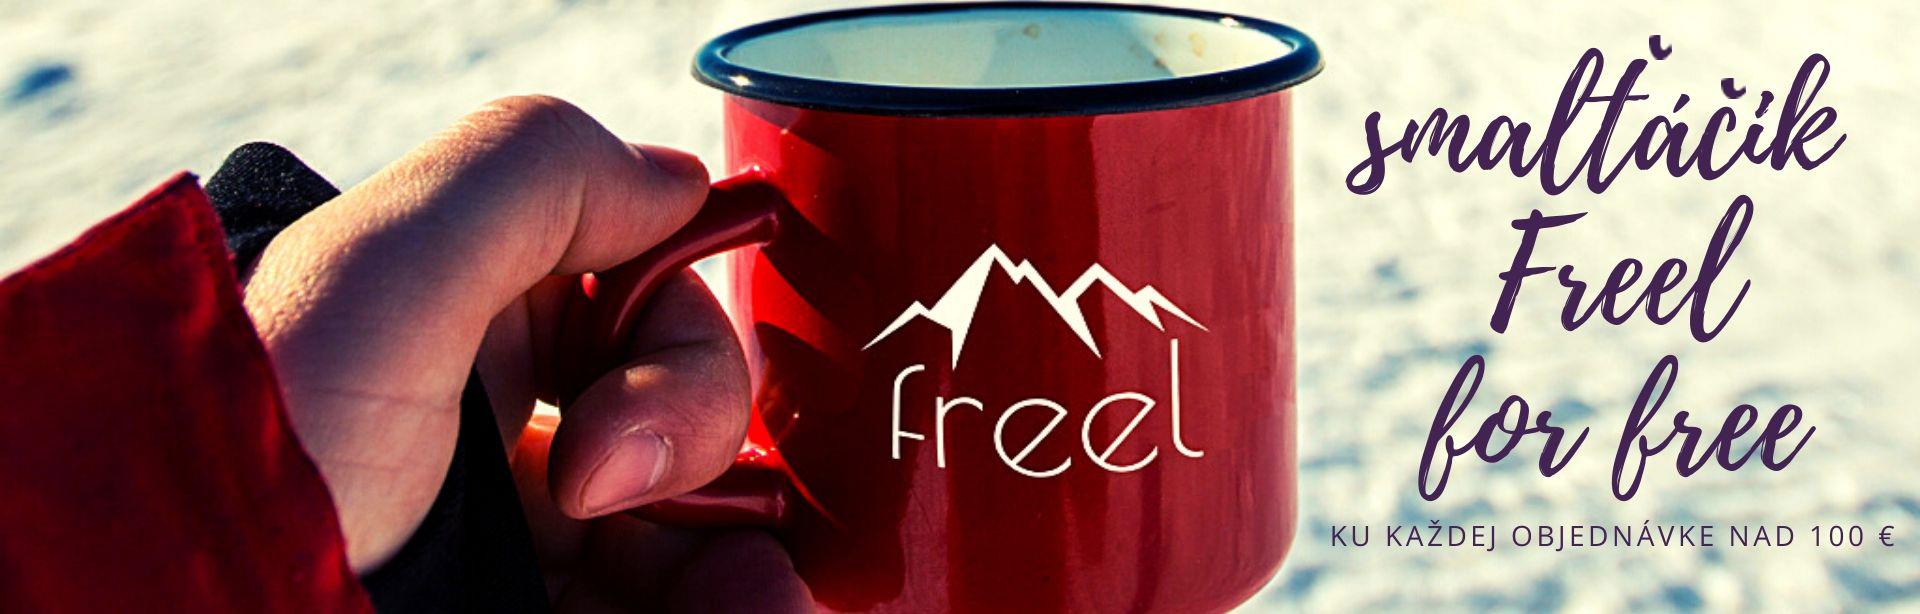 smaltacik-zadarmo_Freel-for-free